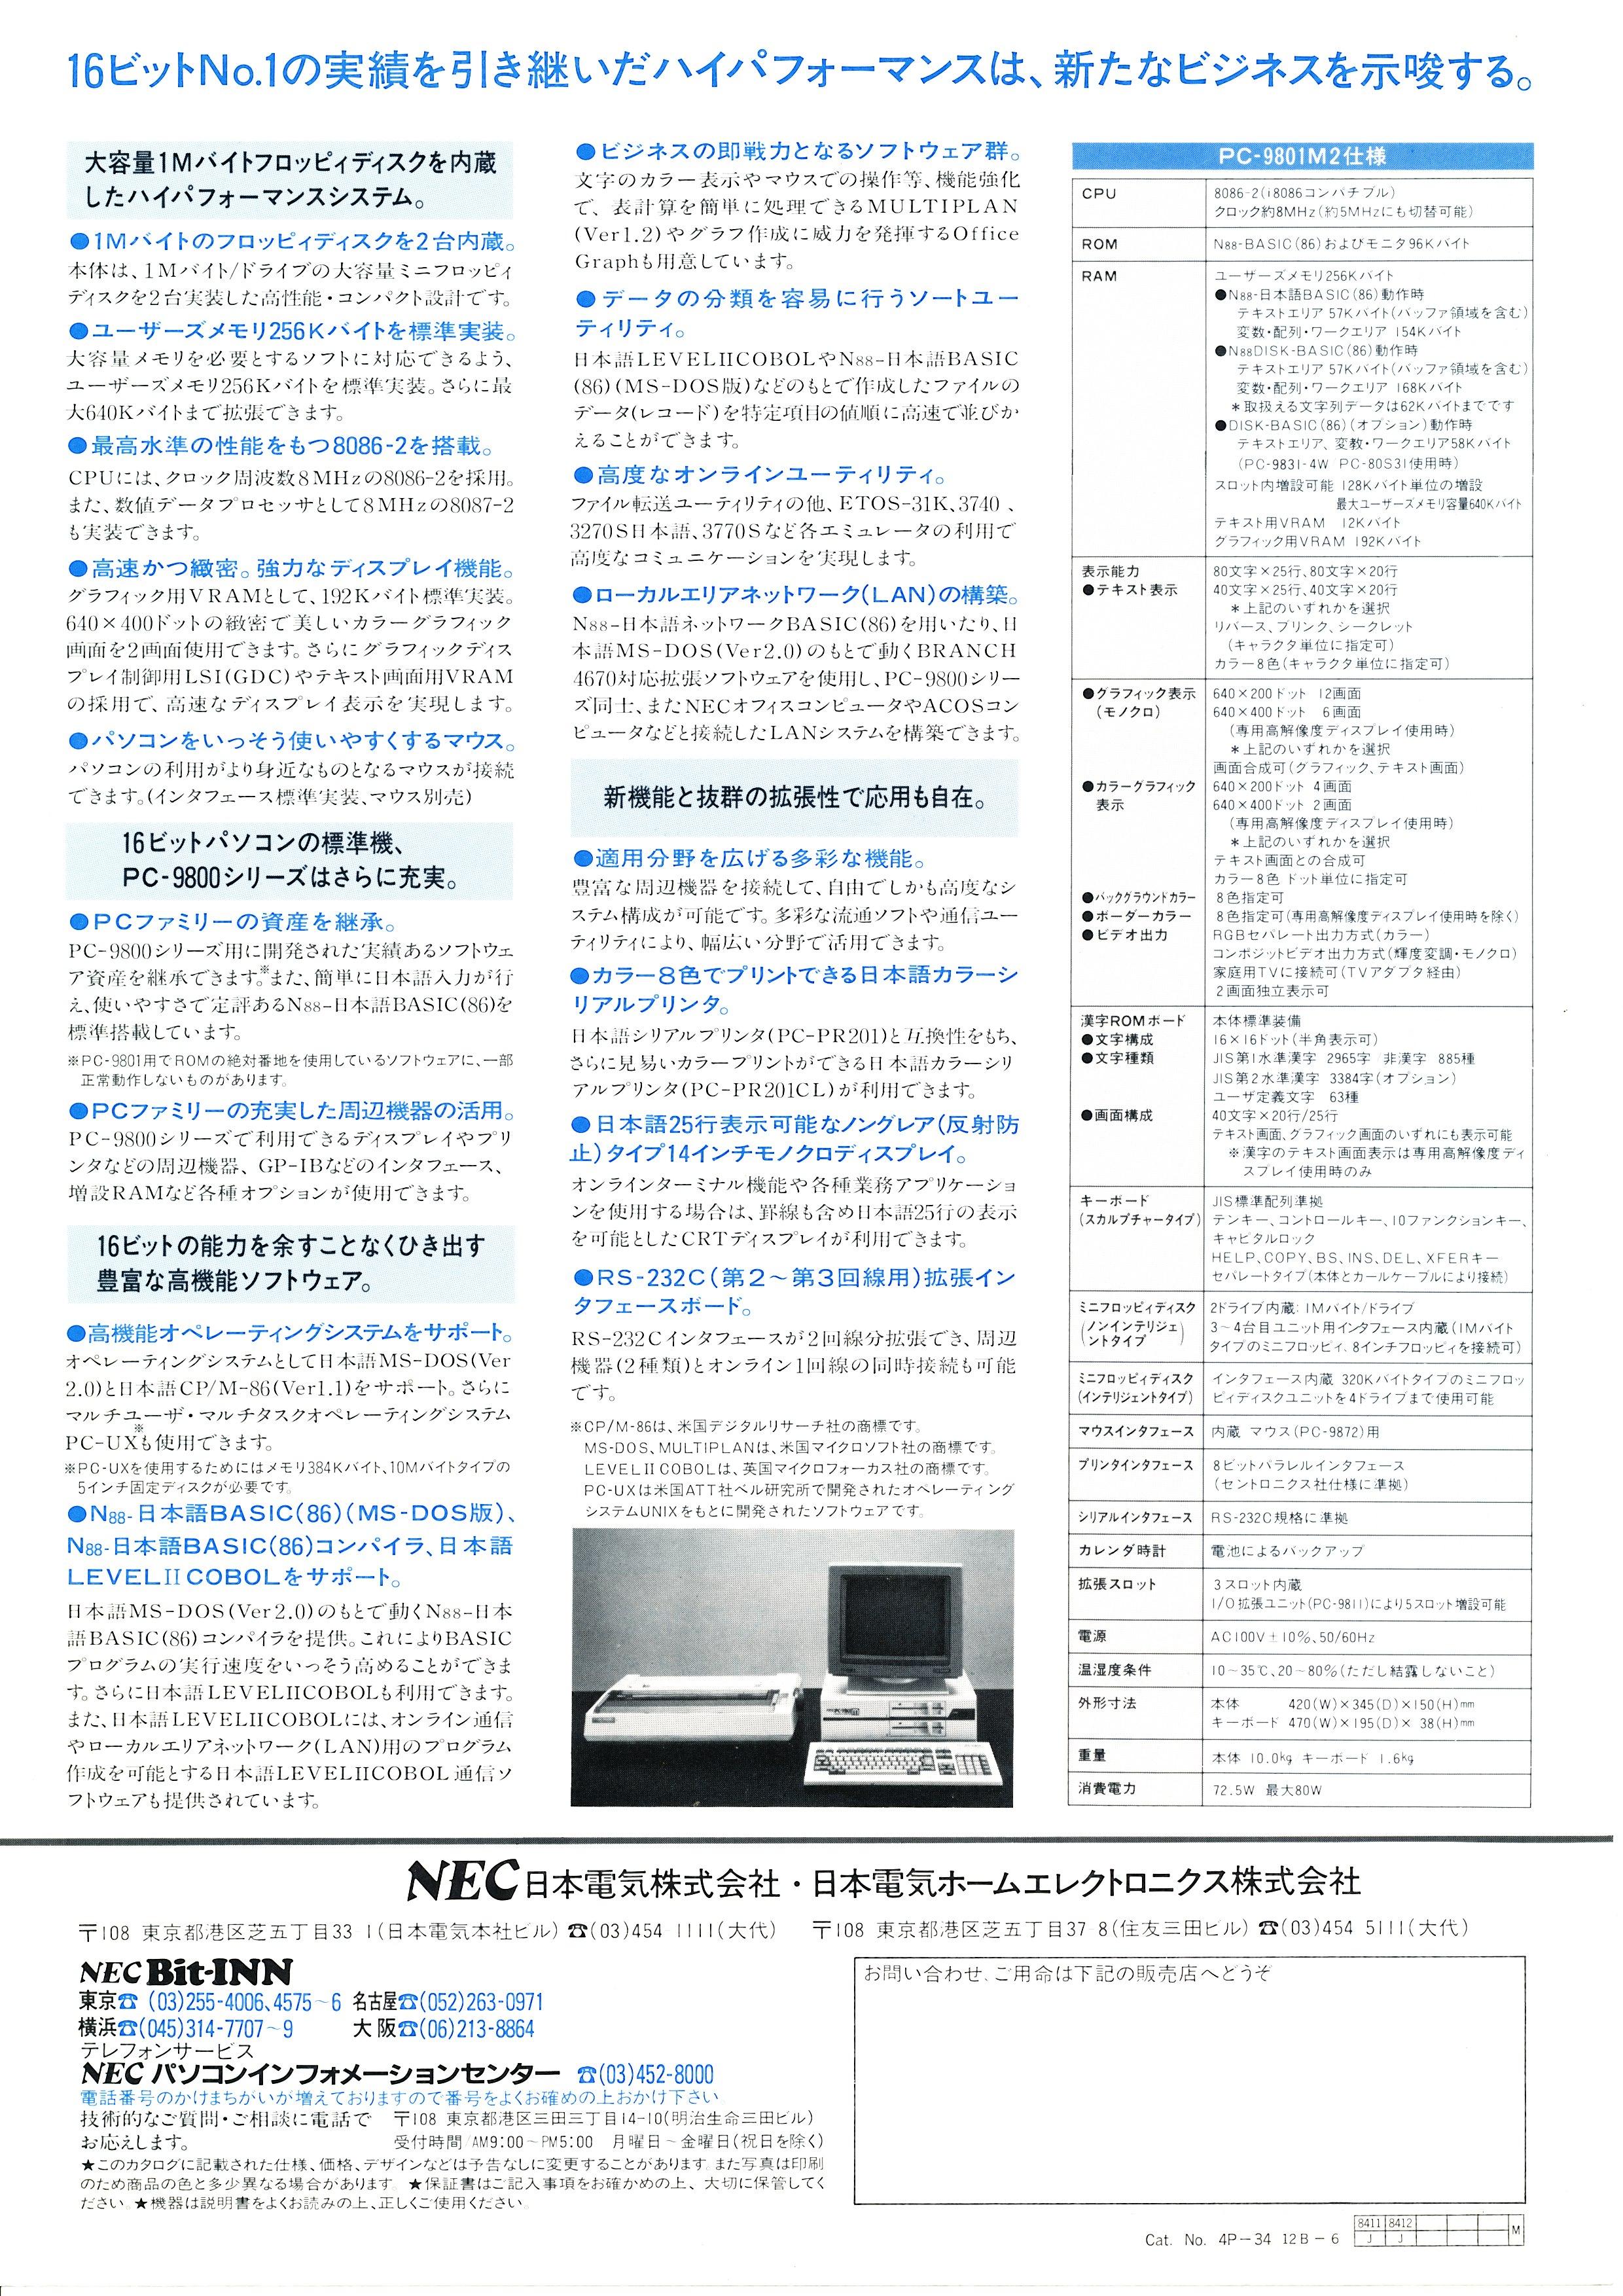 PC-9801m2 P2